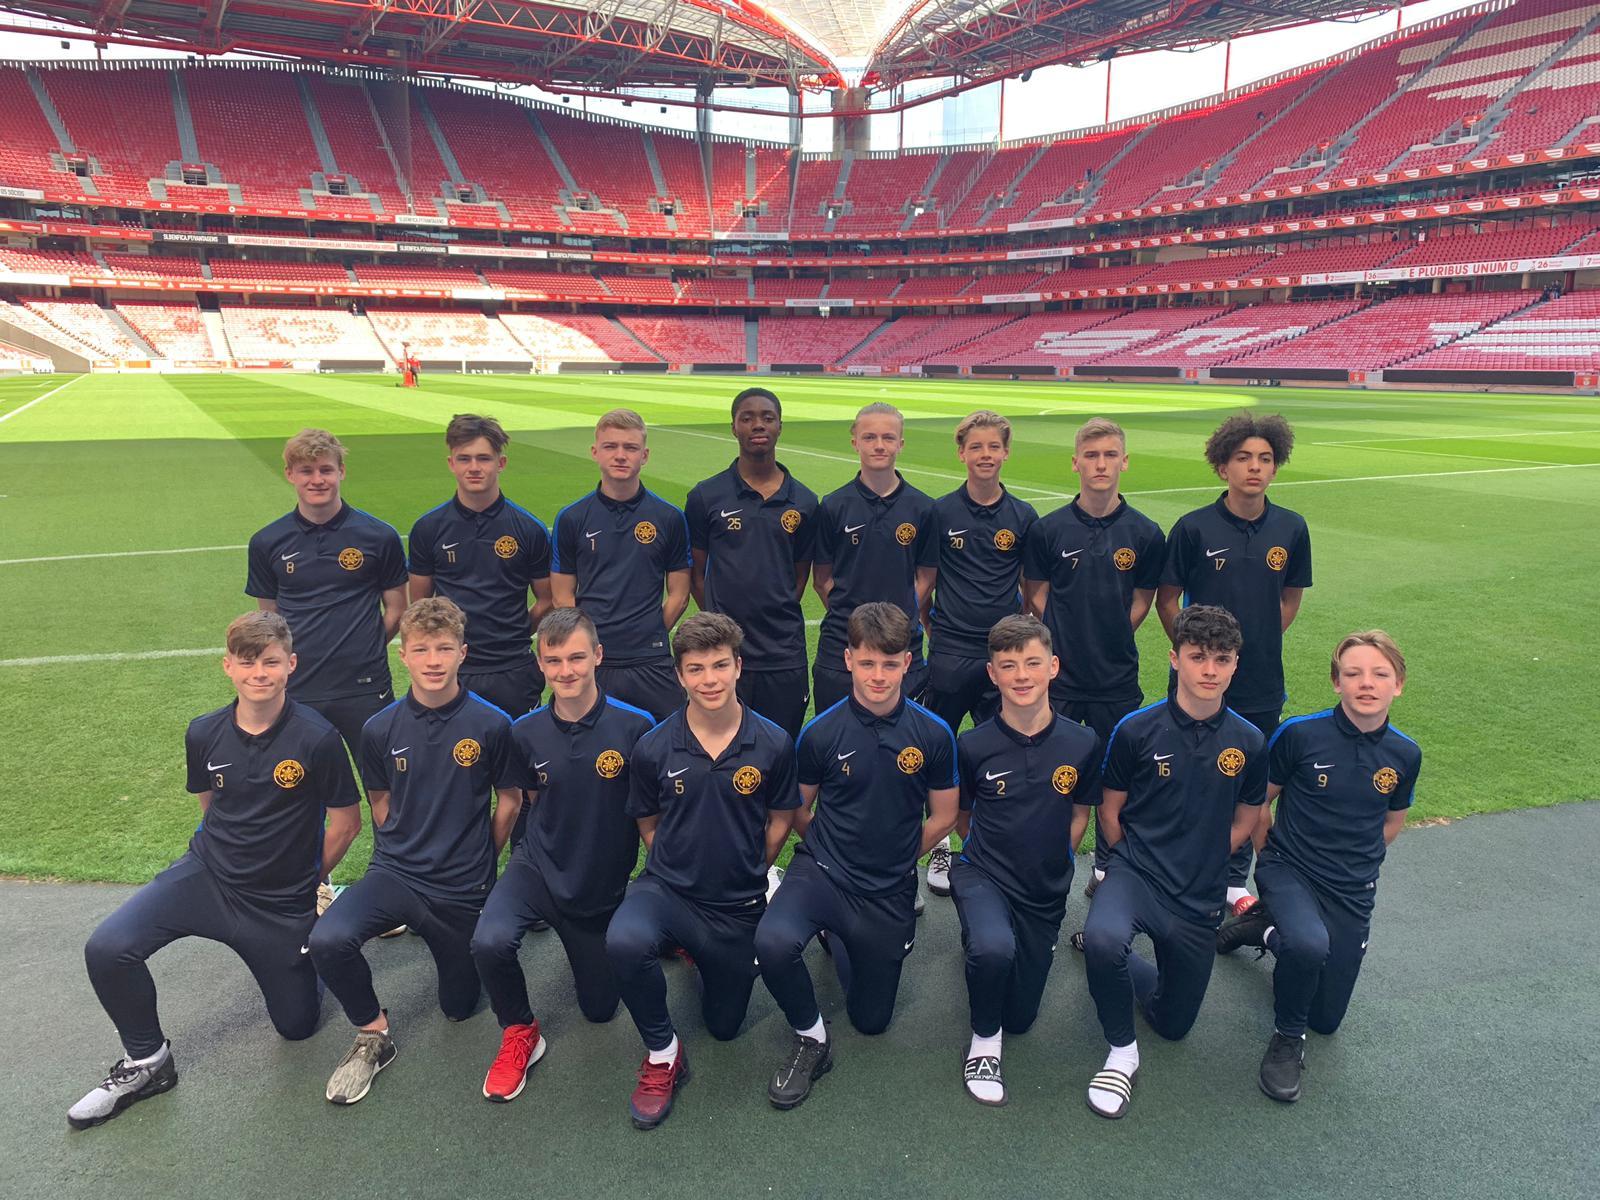 Football-Tour-Portugal-Sevenoaks-Spain-Italy-sports-ventures-benfica